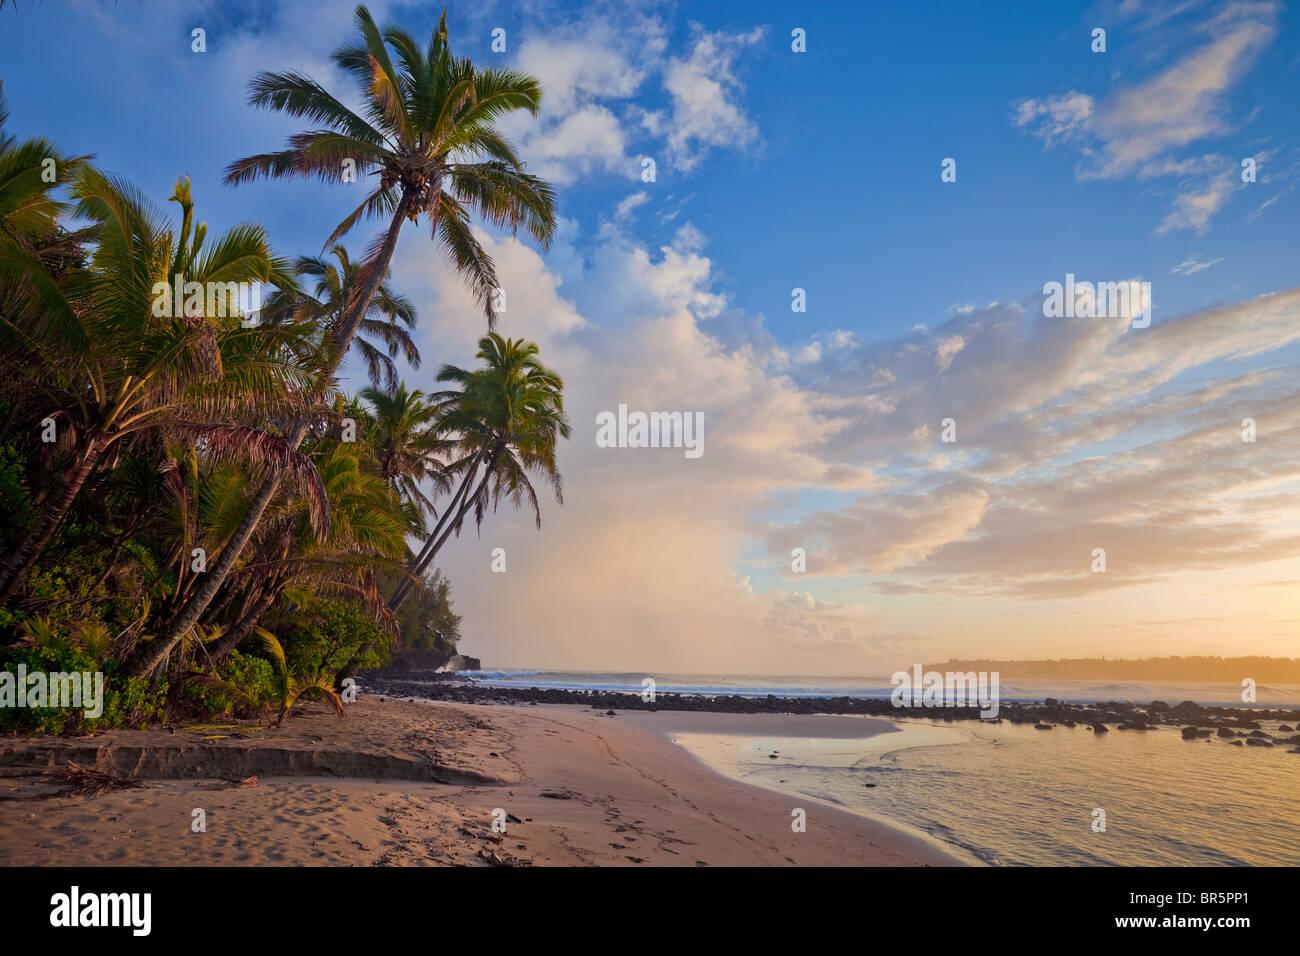 Kauai, HI Sunrise clouds and overhanging palm trees on Hanalei Bay near Makahoa point - Stock Image